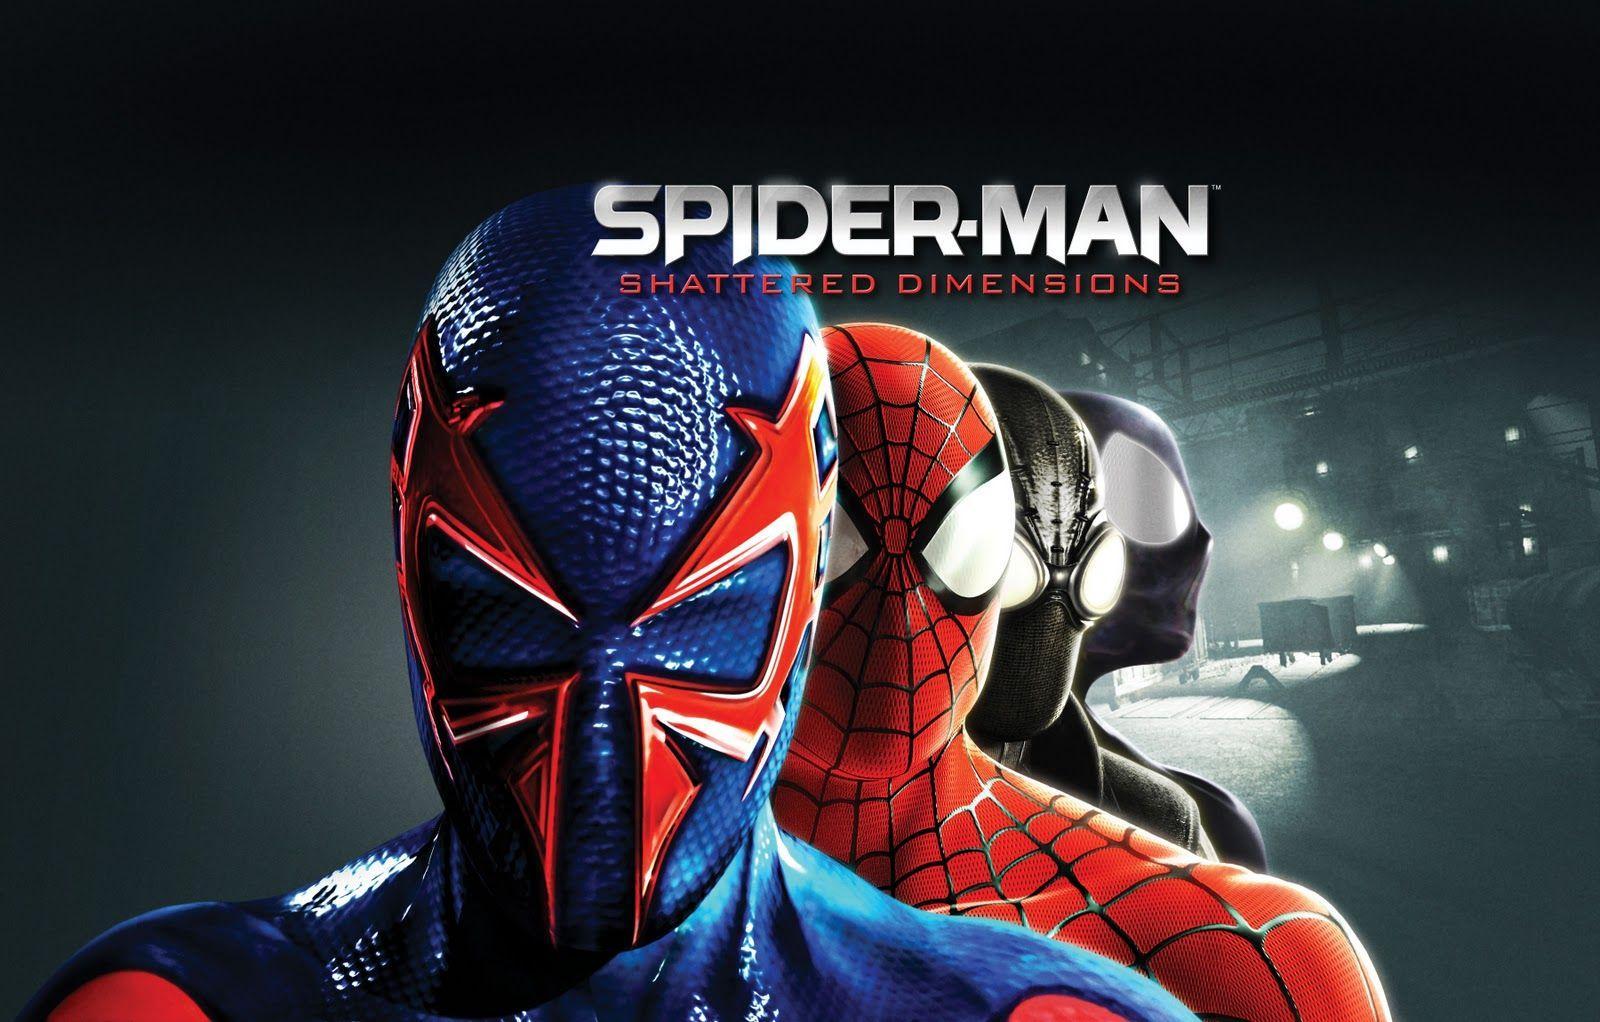 Cool Spiderman 2099 Wallpaper: Spider Man 2099 HD Wallpapers